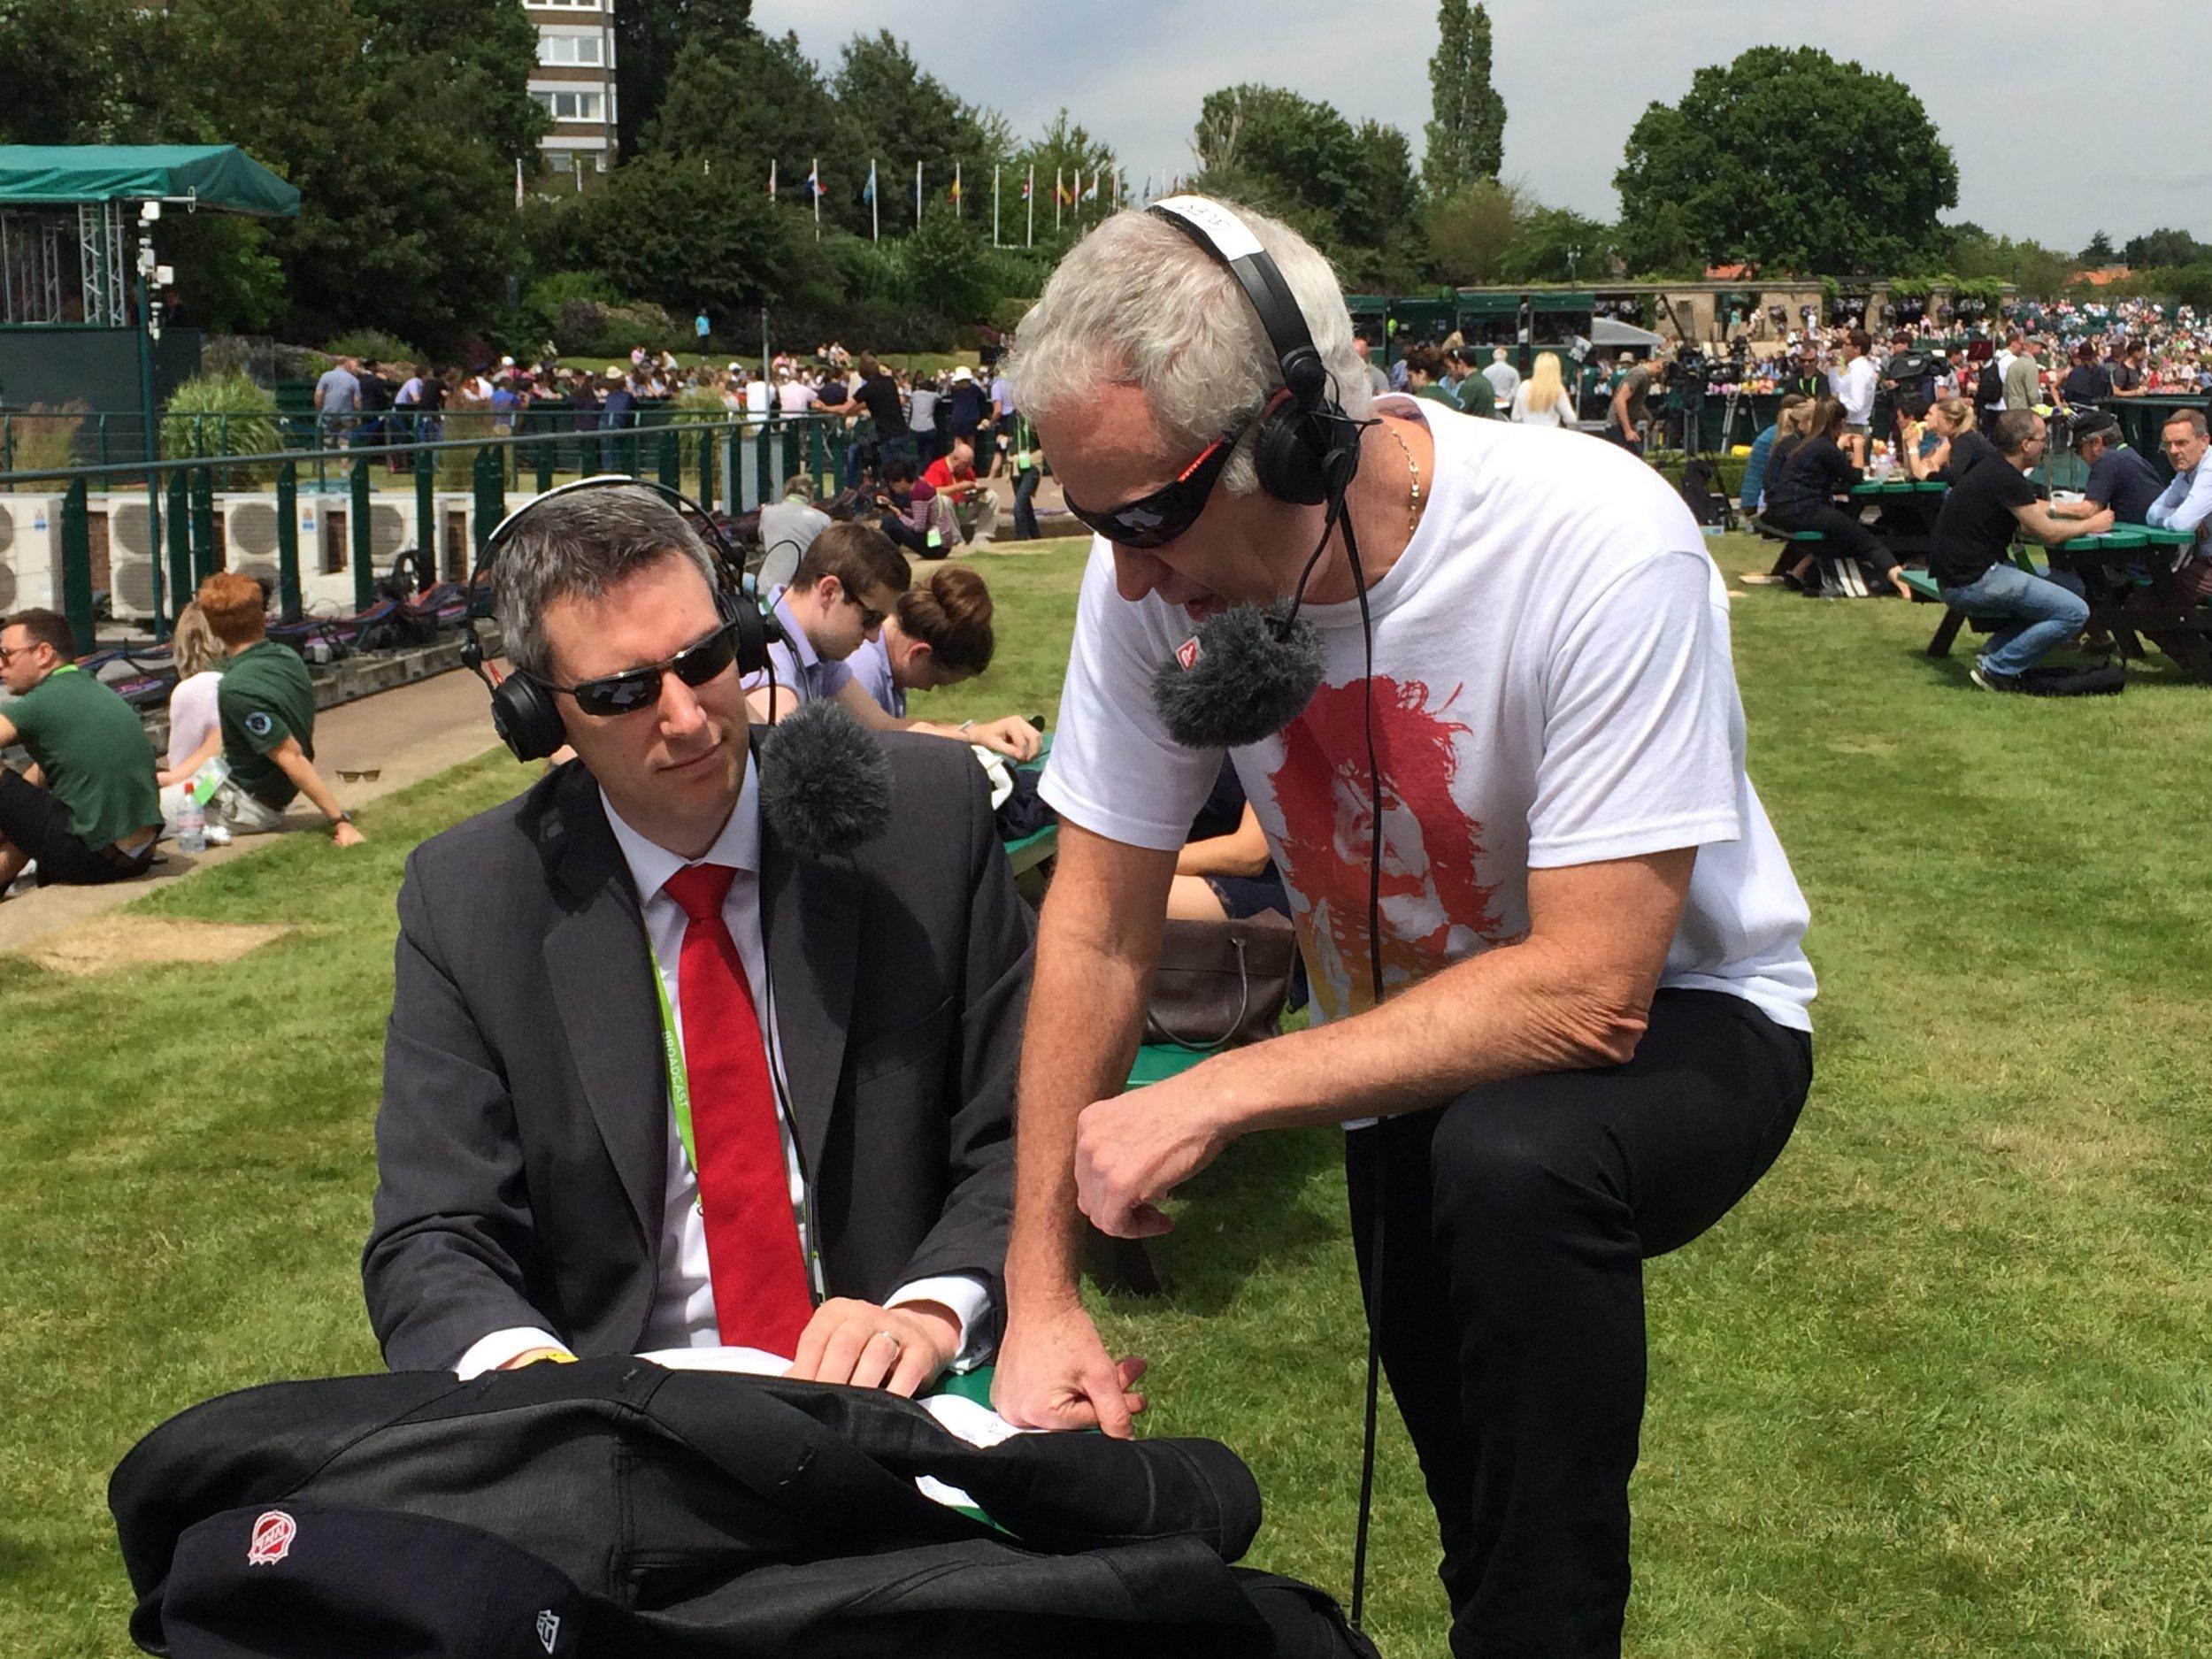 David with 'Commissioner McEnroe'